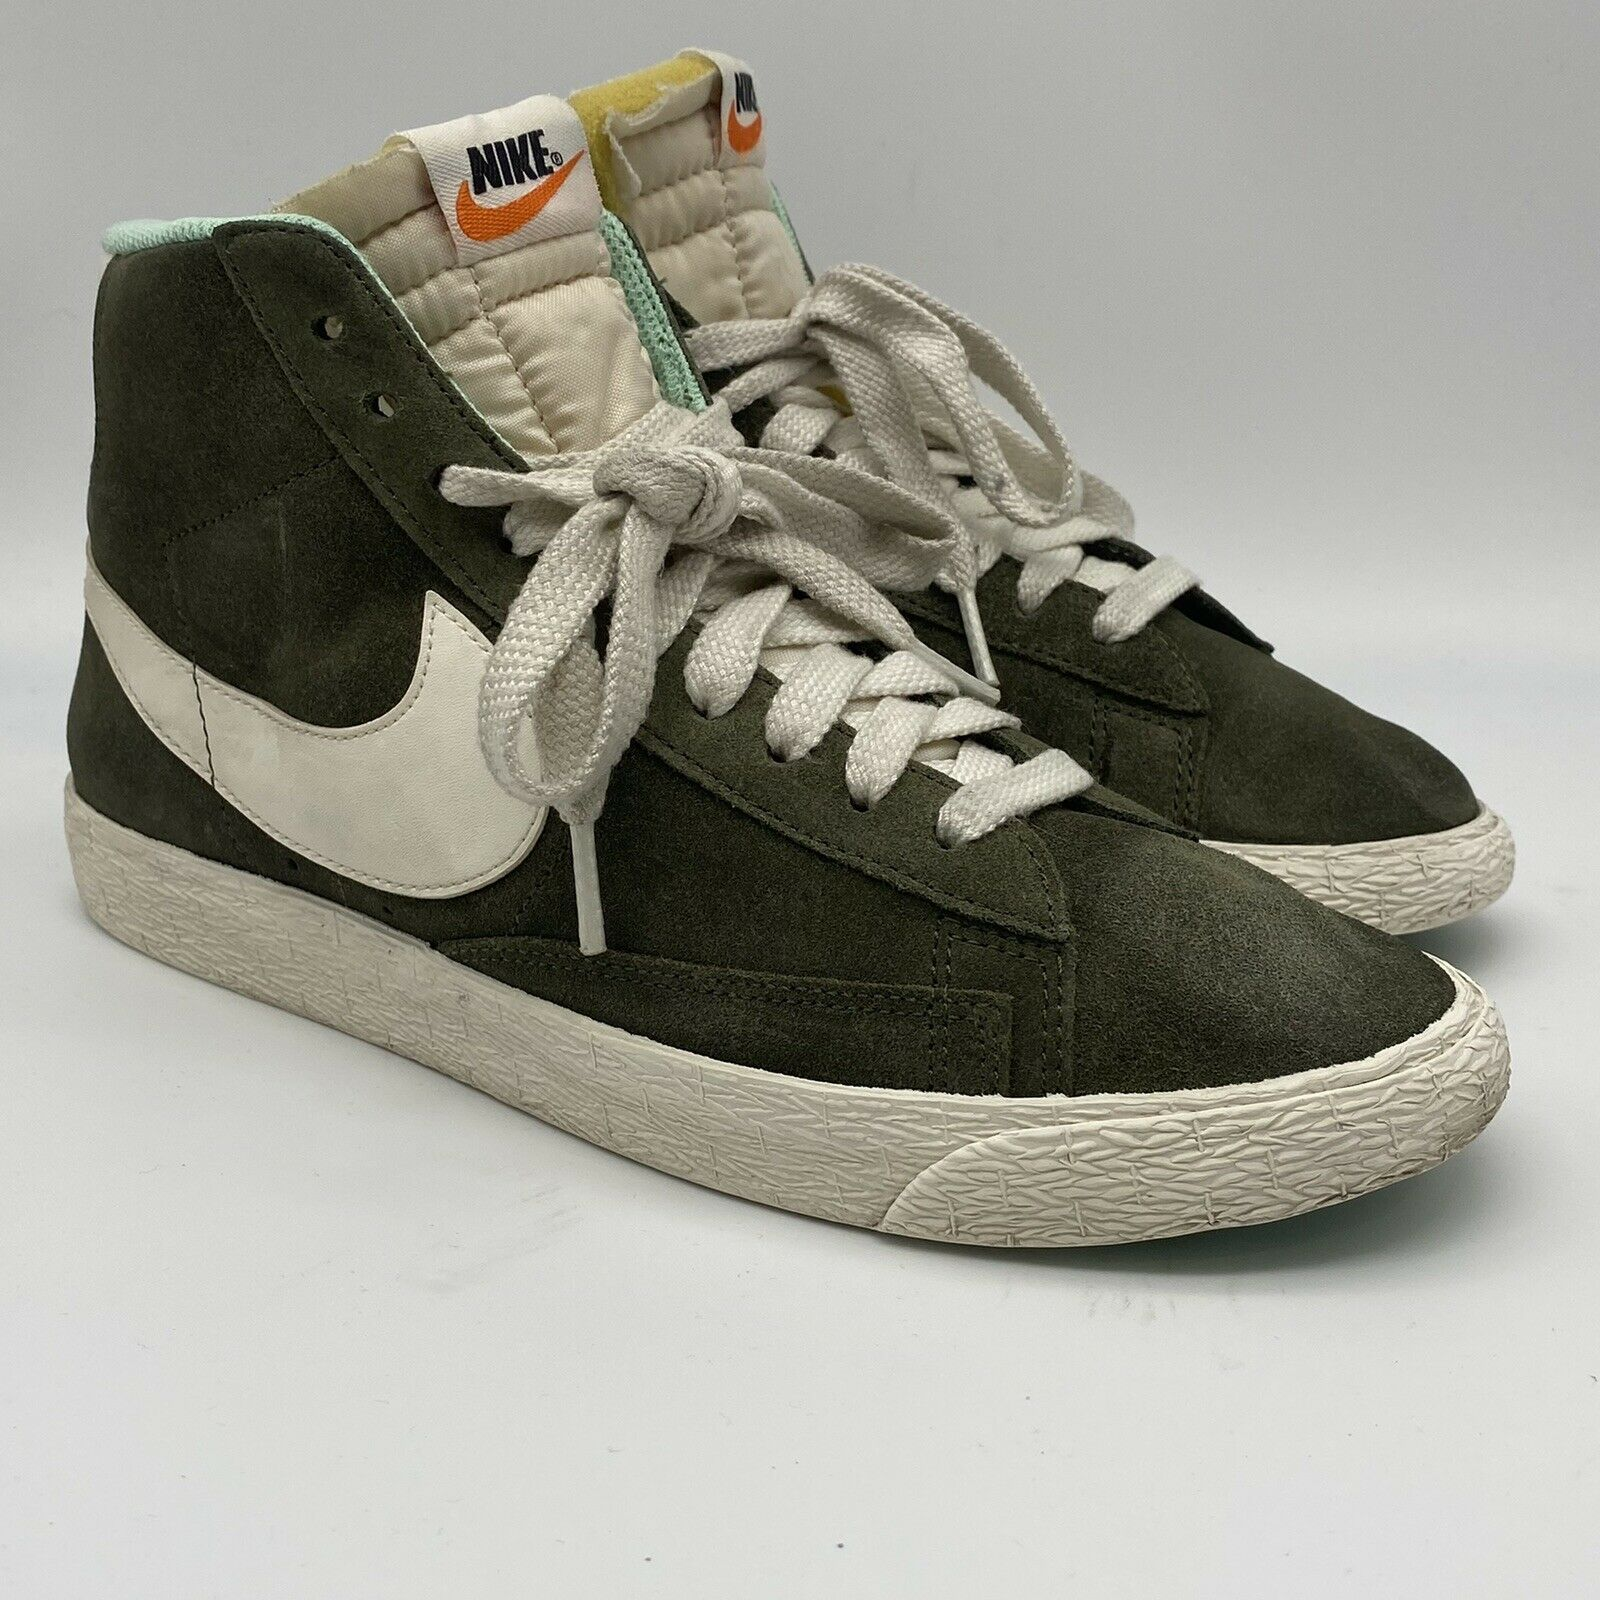 Size 9 - Nike Blazer Mid Suede Olive Green for sale online   eBay